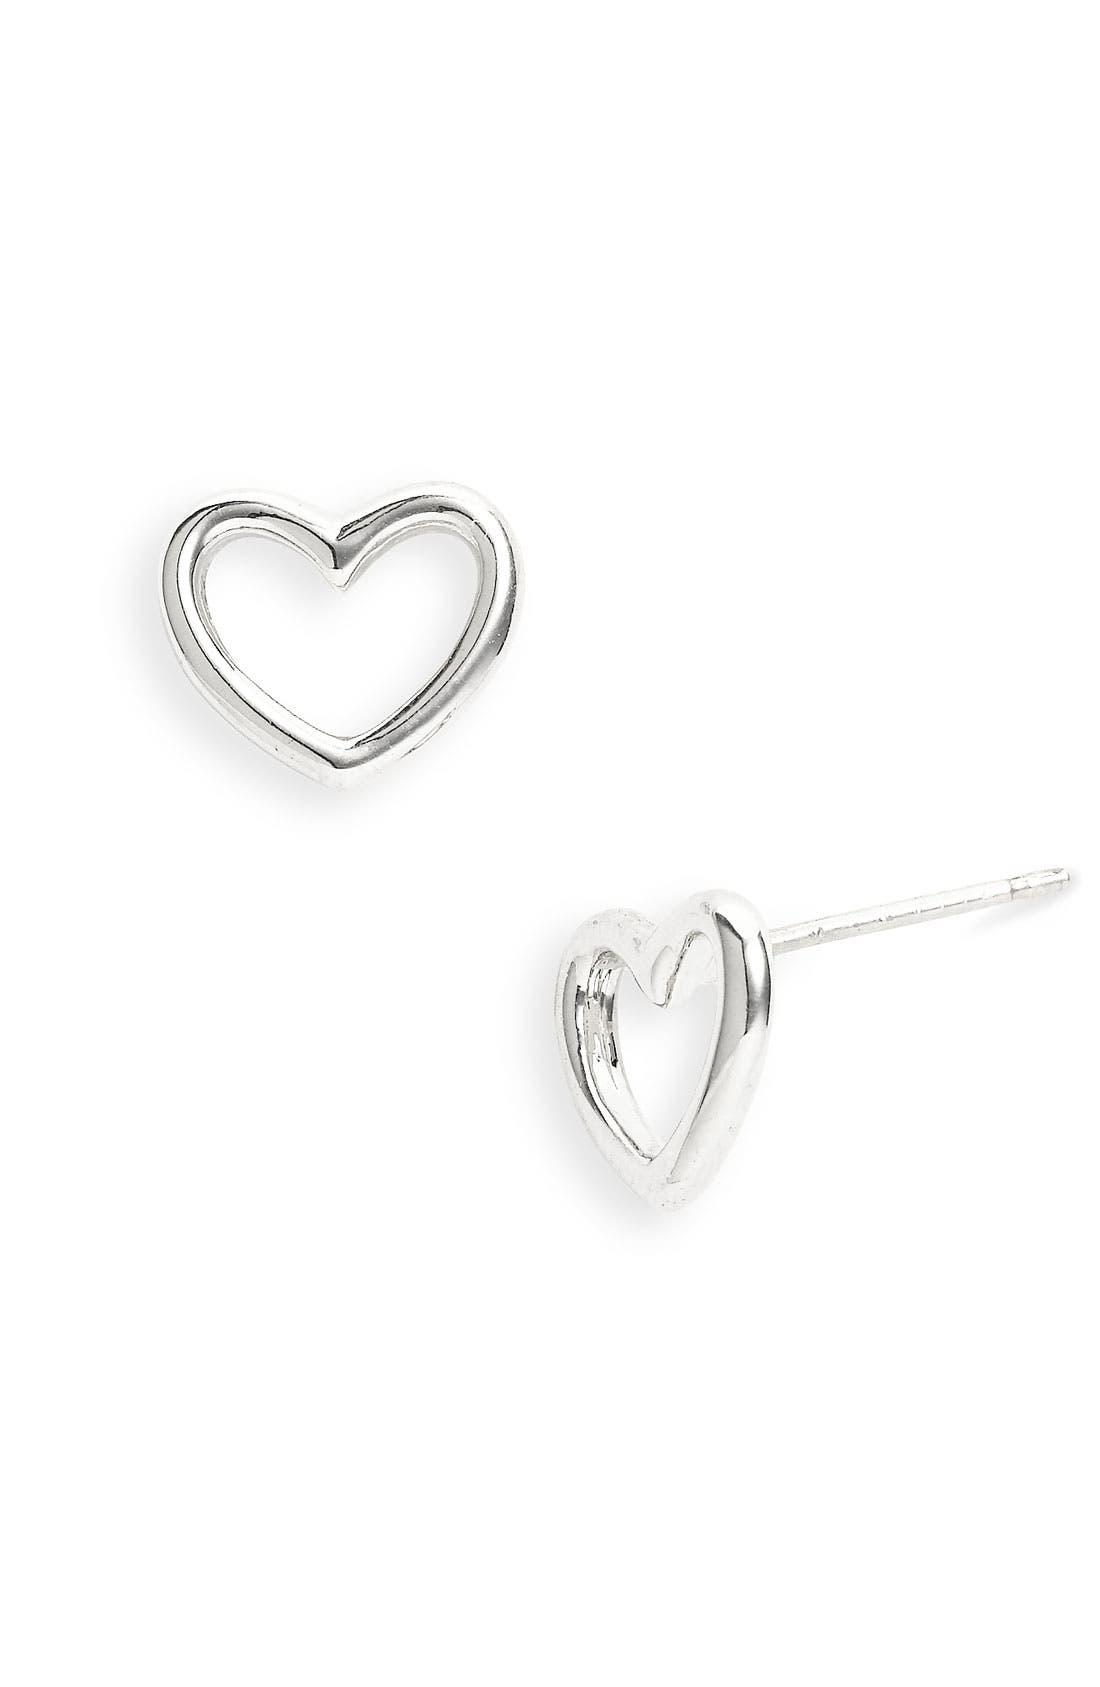 MARC BY MARC JACOBS 'Love Edge' Heart Stud Earrings, Main, color, 040